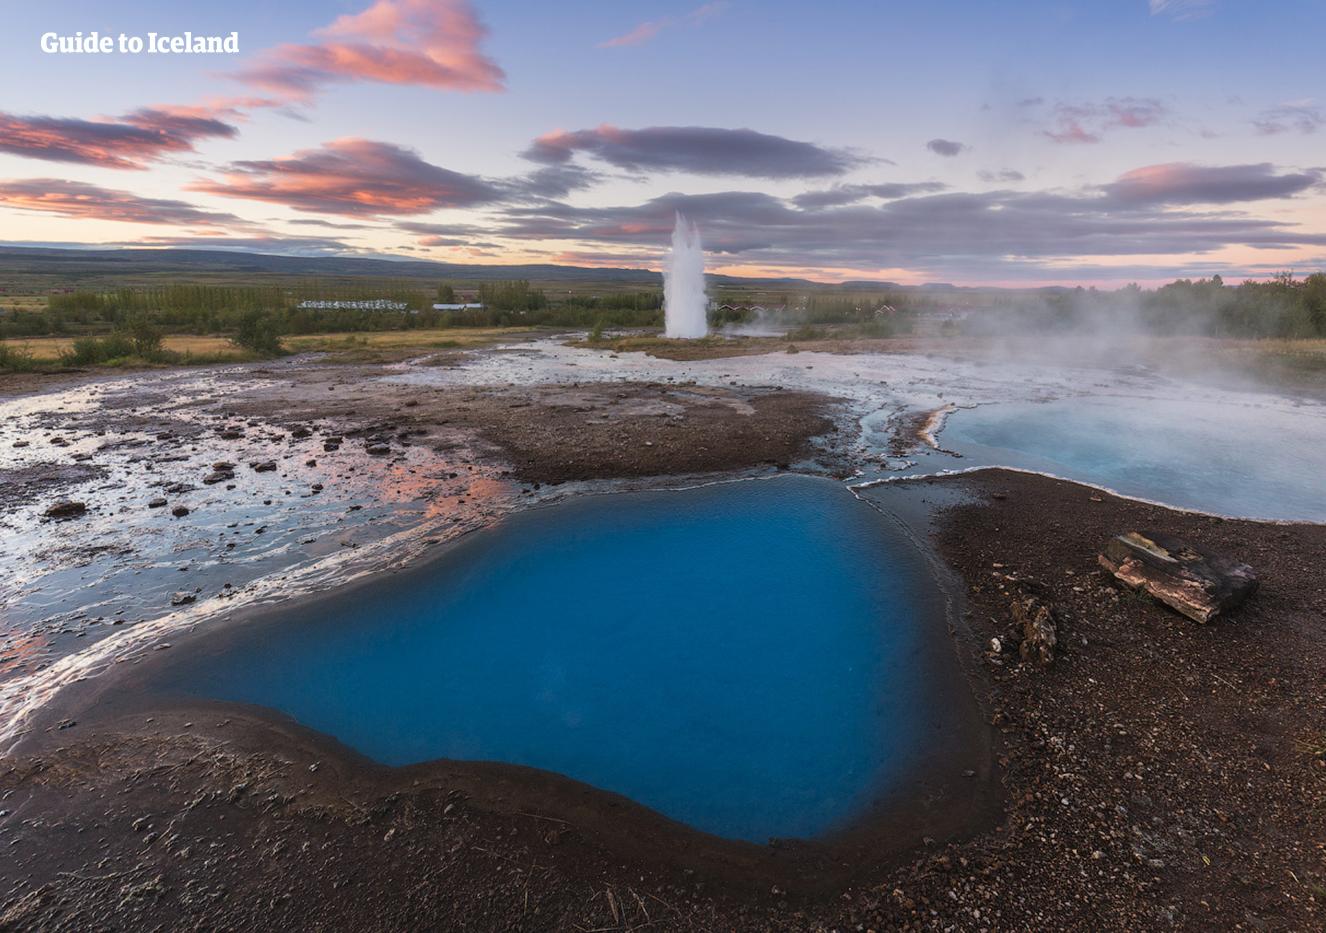 En la zona geotérmica de Geysir verás a Strokkur entrar en erupción cada cinco o diez minutos.